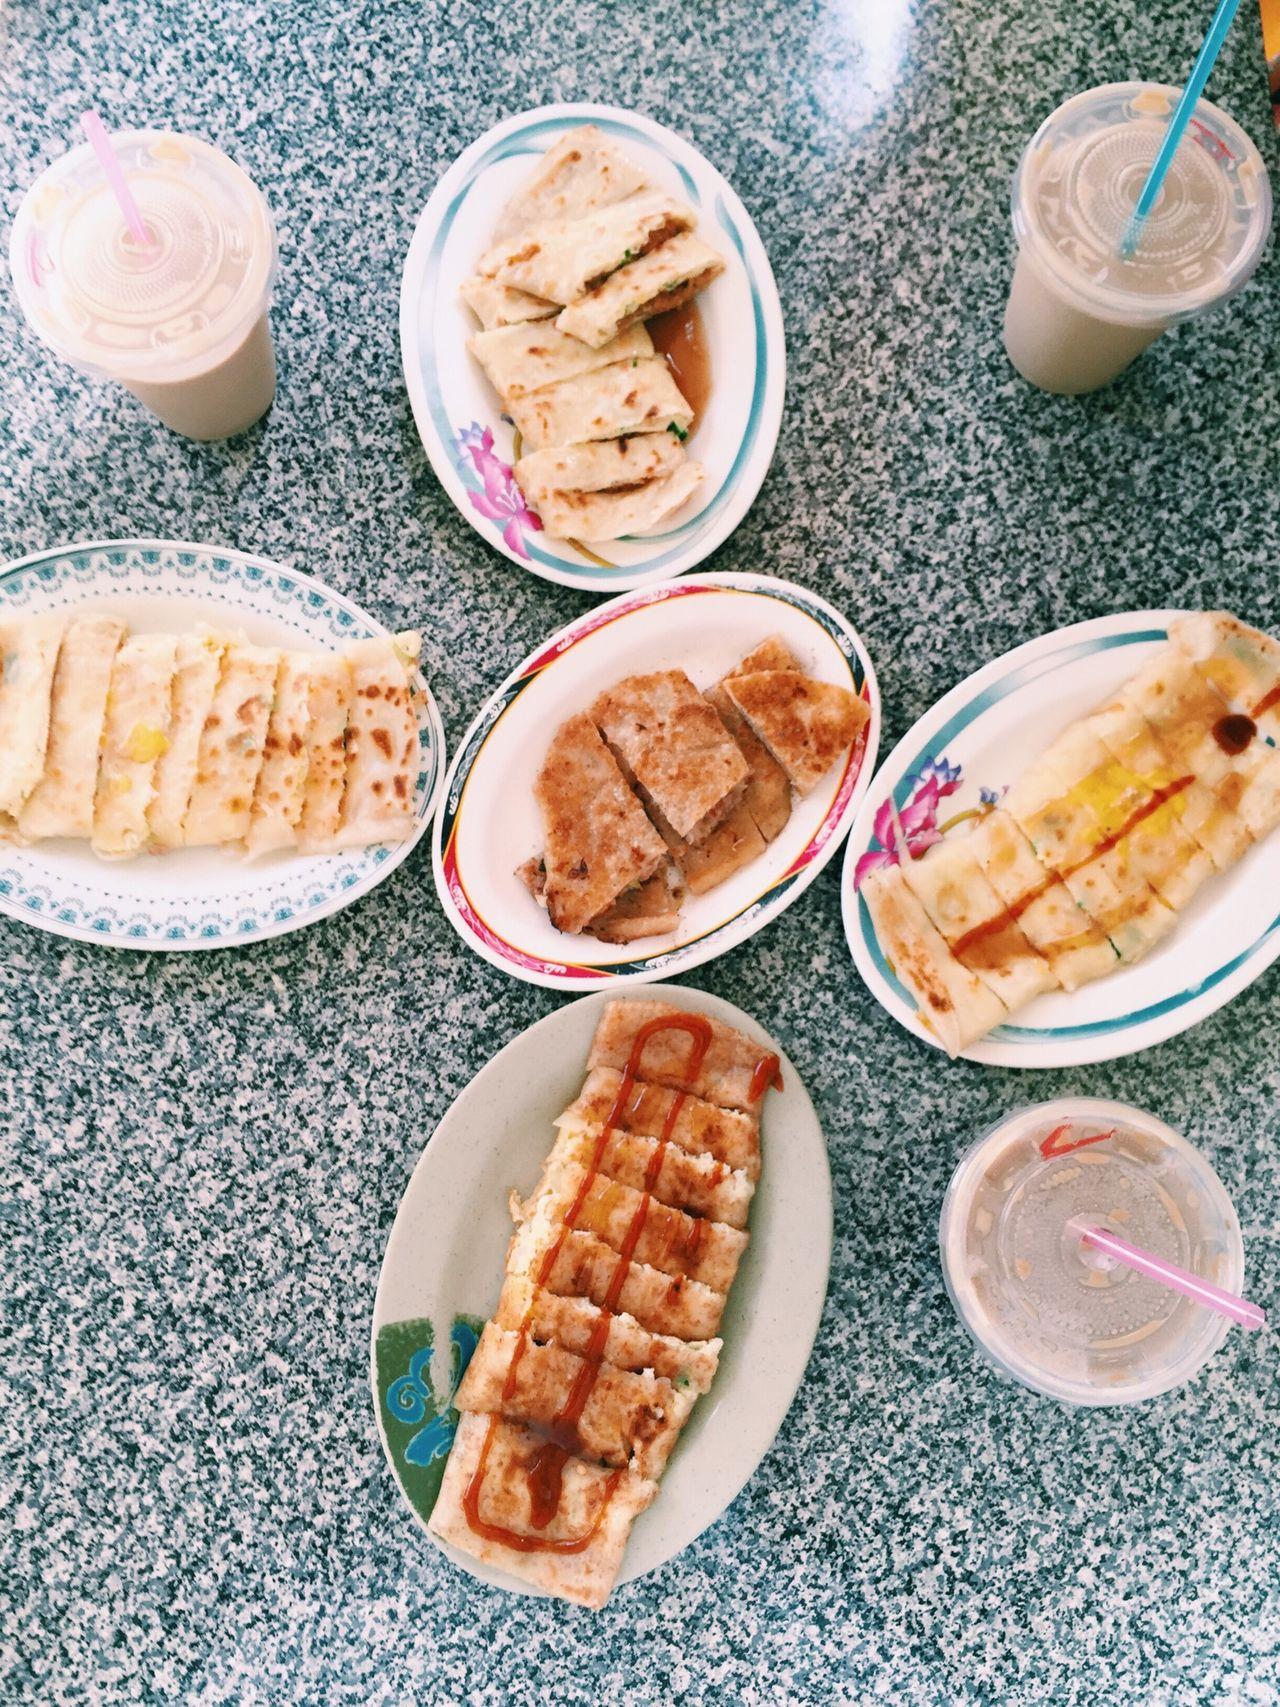 Beautiful stock photos of guten morgen, Pingtung, Taiwan, Vertical Image, breakfast